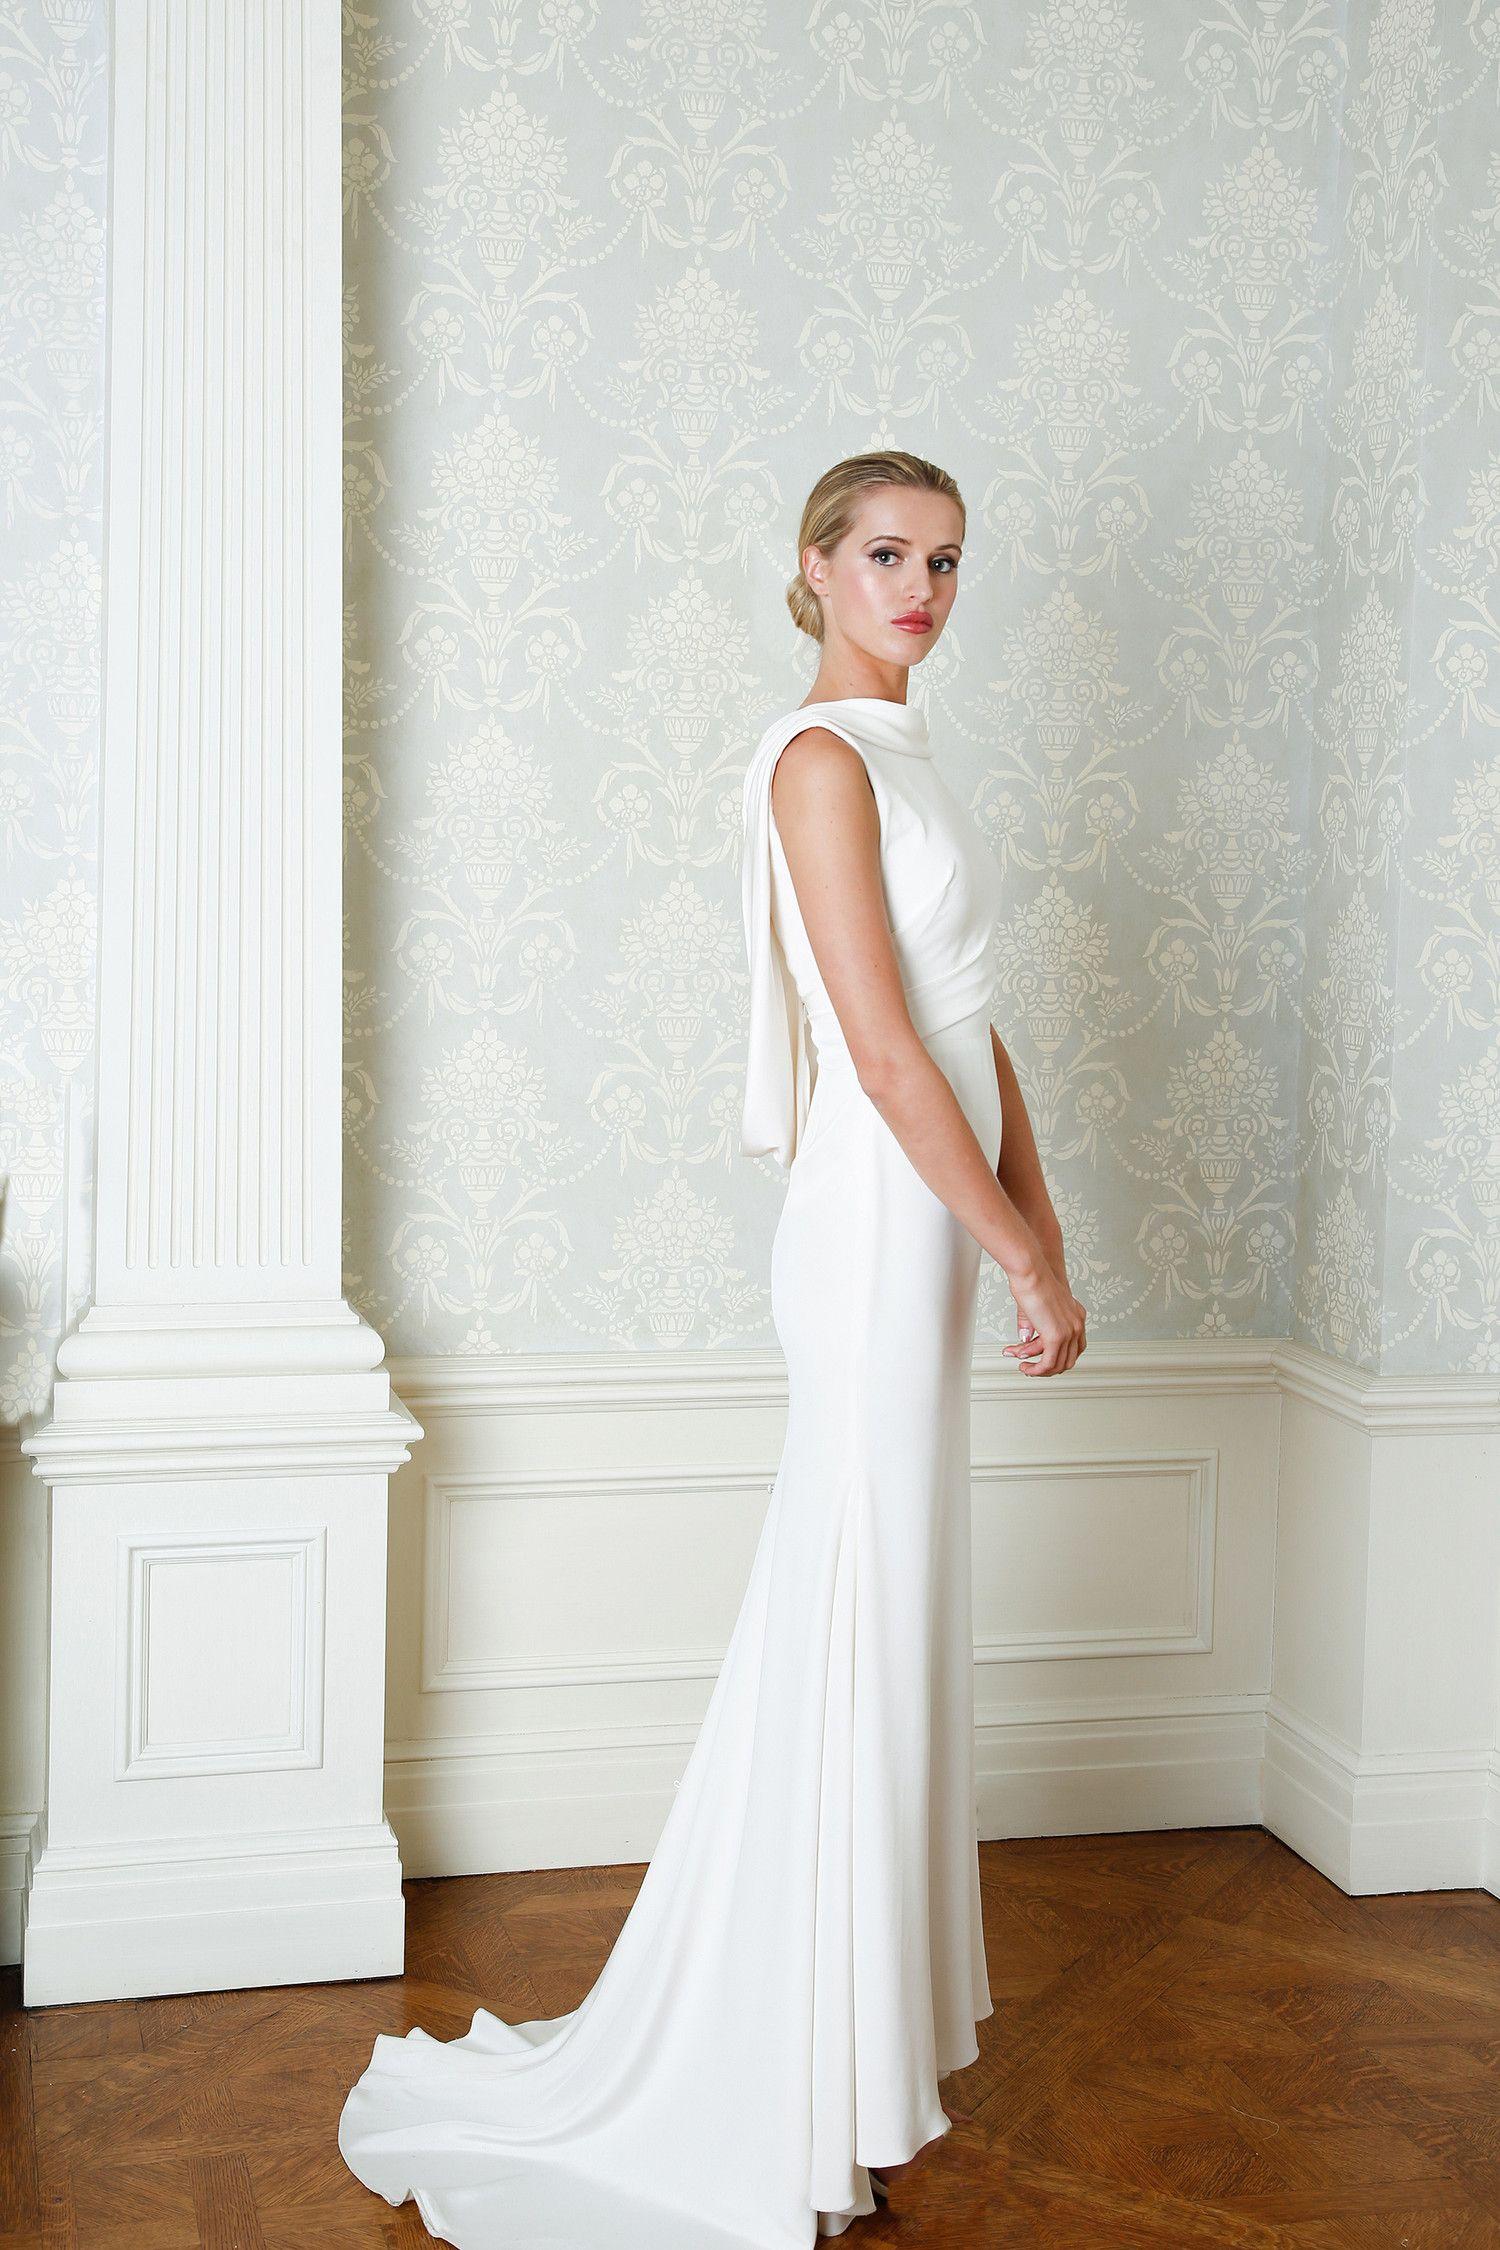 Simple Wedding Dresses That Are Just Plain Chic Wedding Dresses Simple Fitted Wedding Dress Wedding Dresses Lace [ 2250 x 1500 Pixel ]